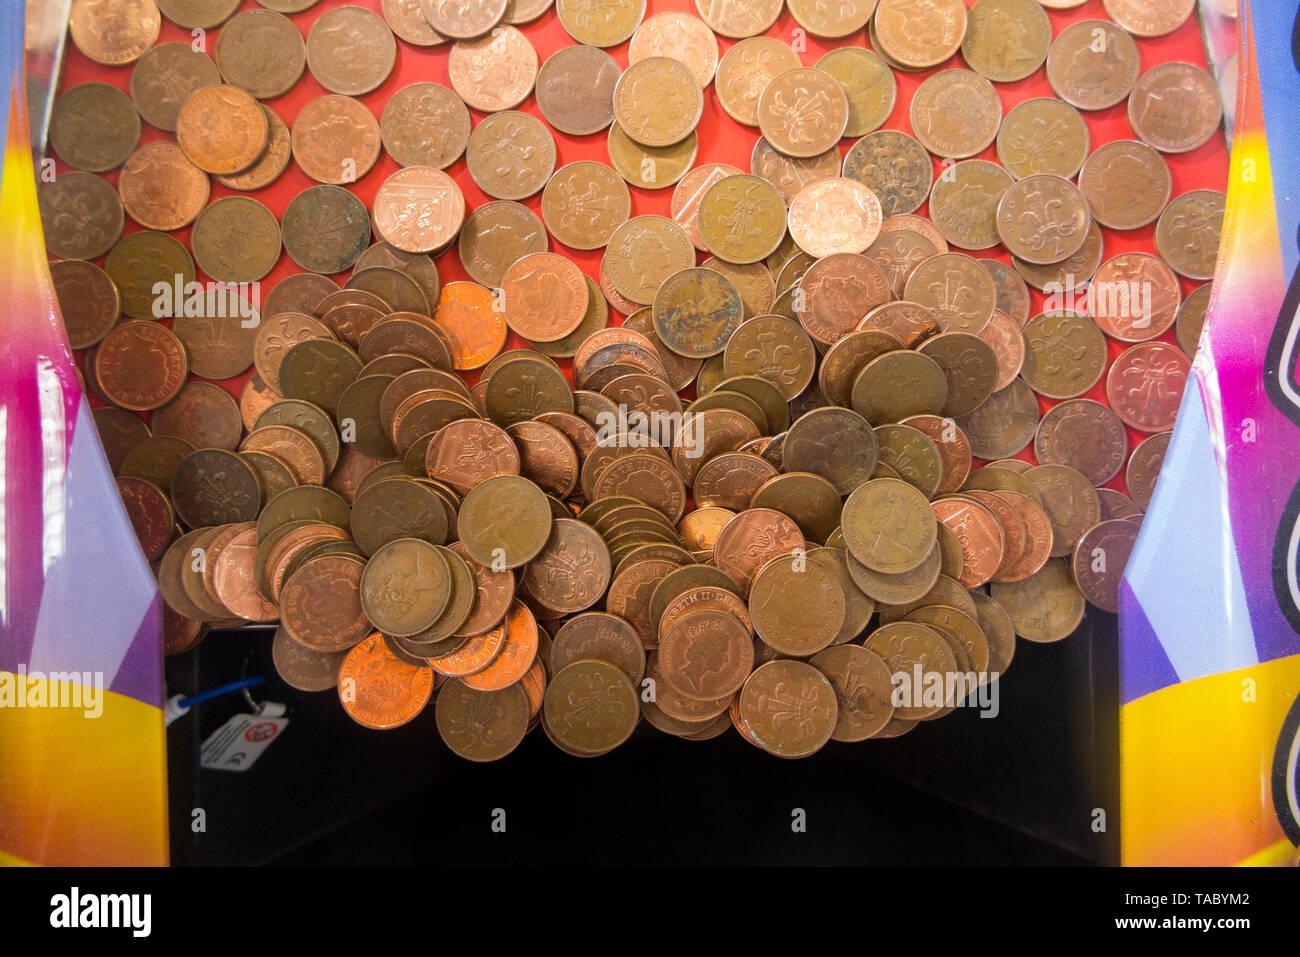 Arcade Amusement Game Coins De Stockamp; Imágenes CBedxo